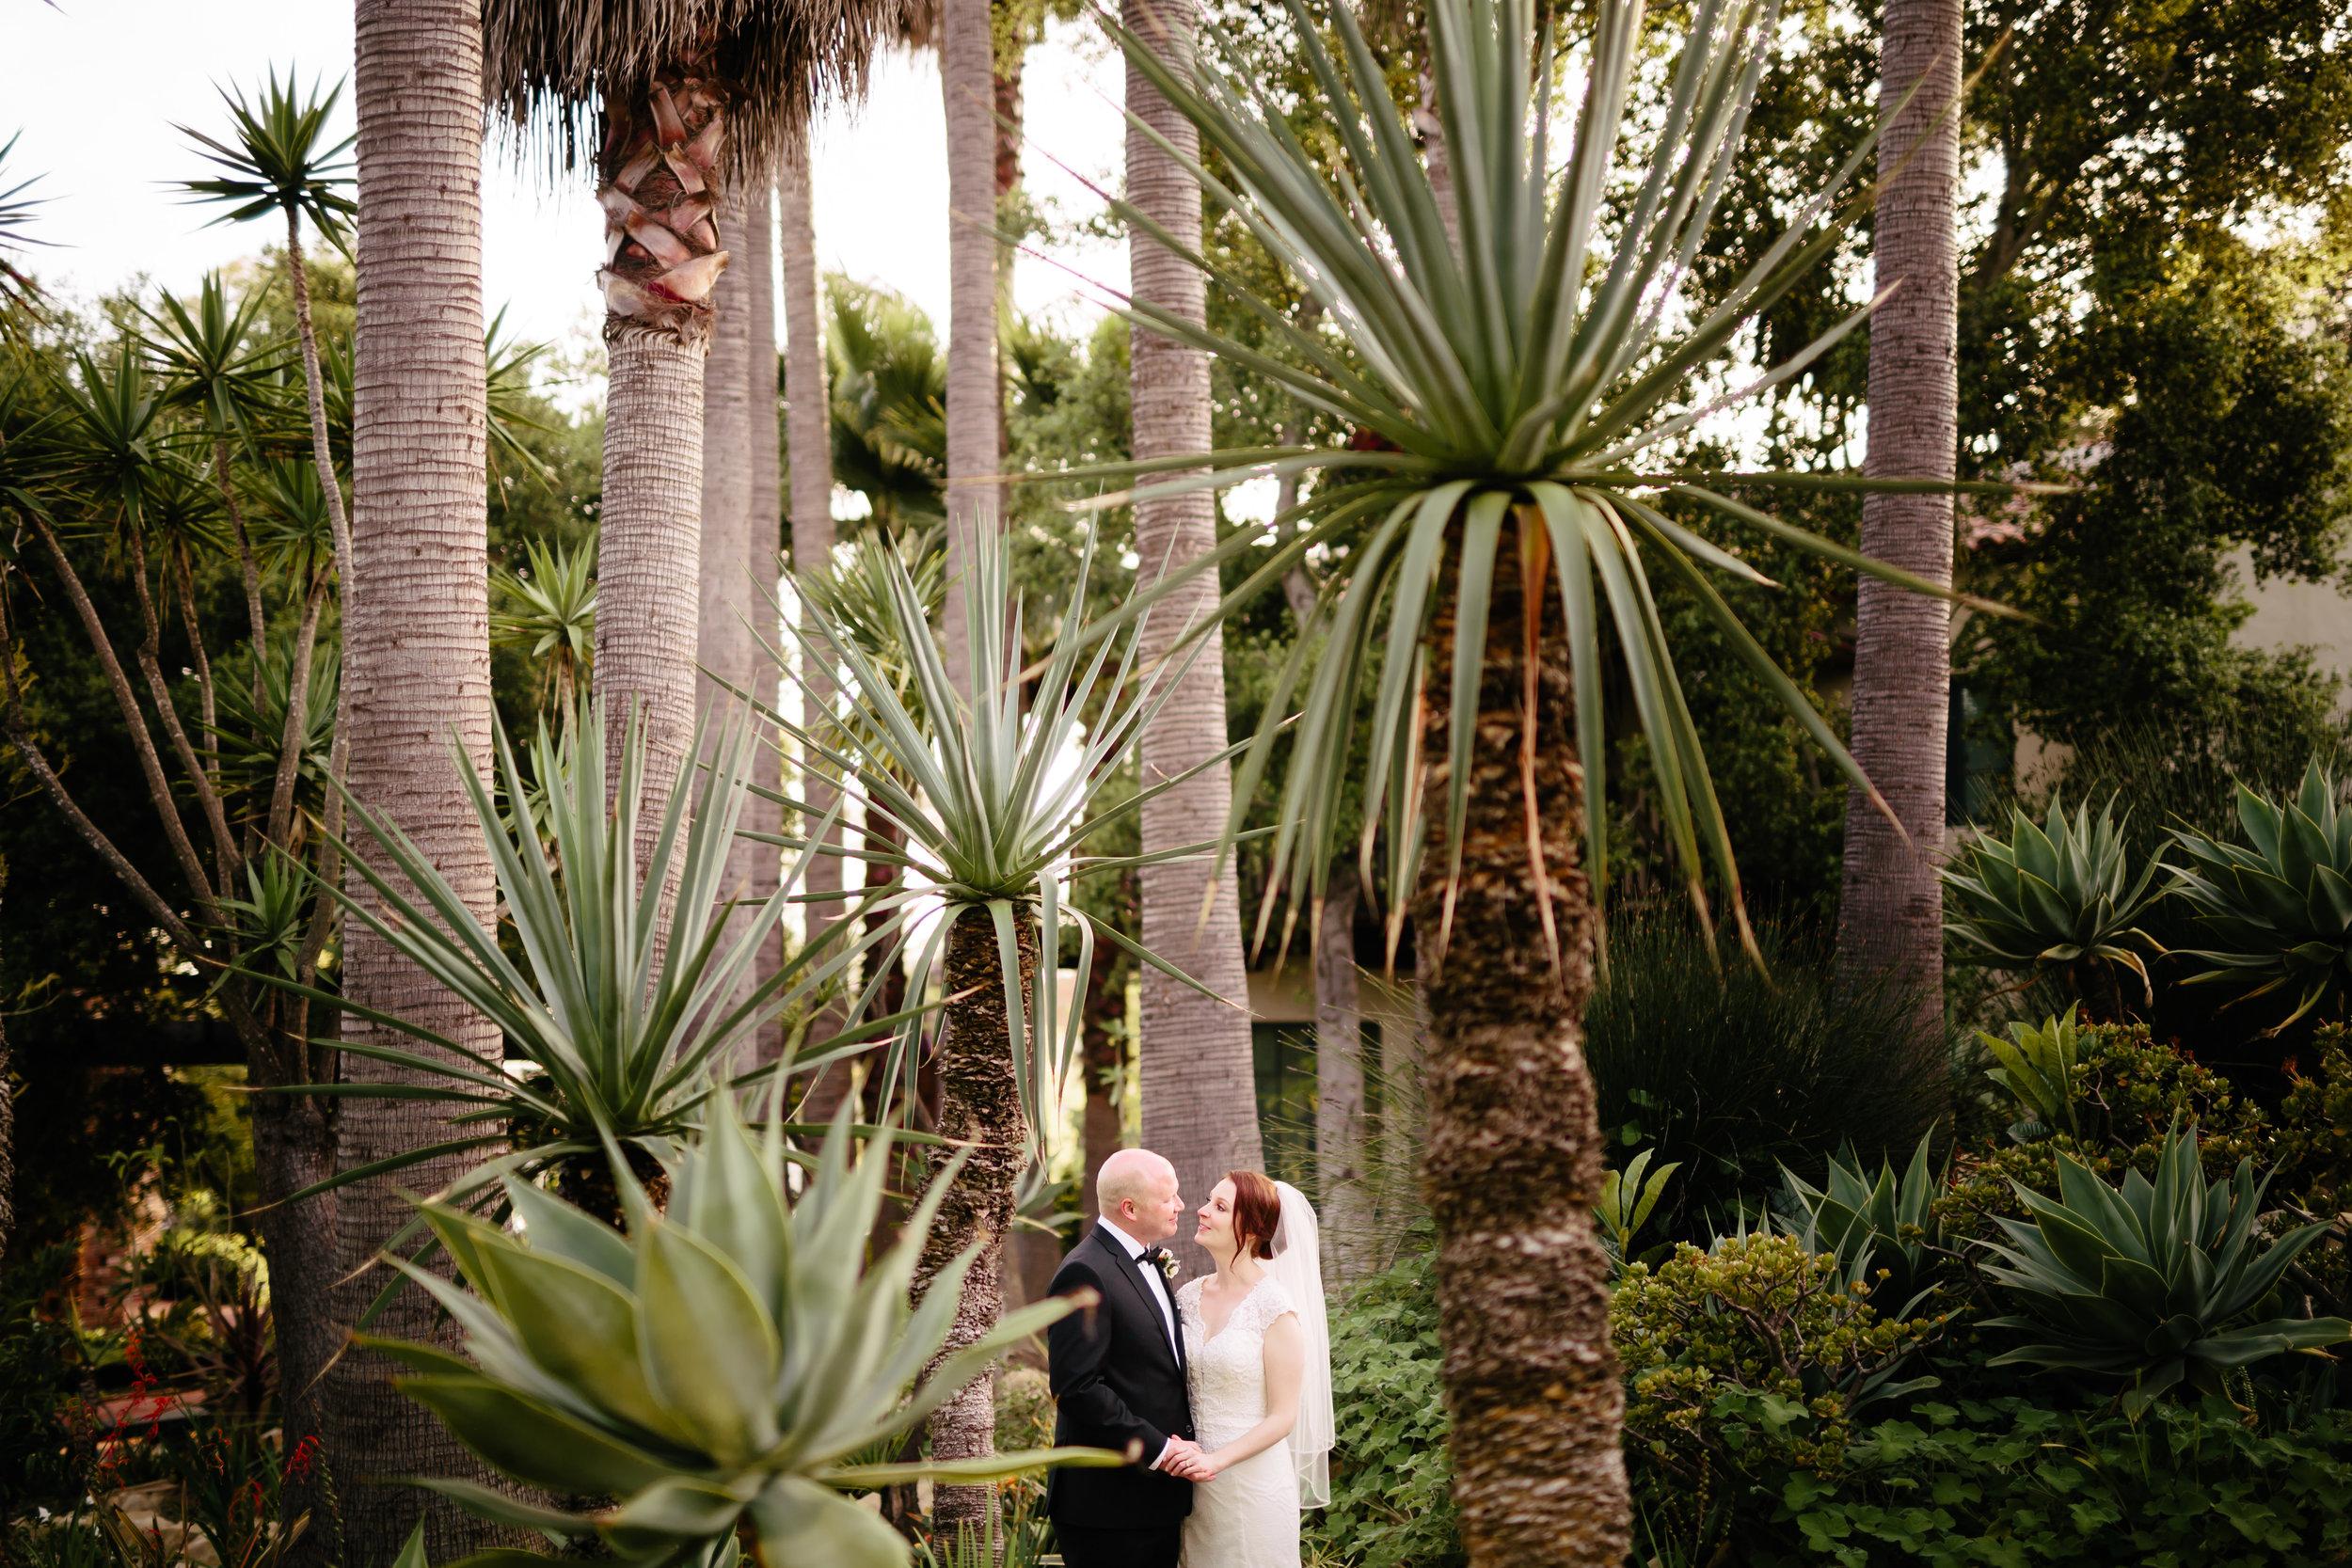 santa-barbara-elopement-wedding-planner-coordinator-day-of-el-encanto-belmond-resort-elope-lily-pond-black-tie-riviera (6).jpg